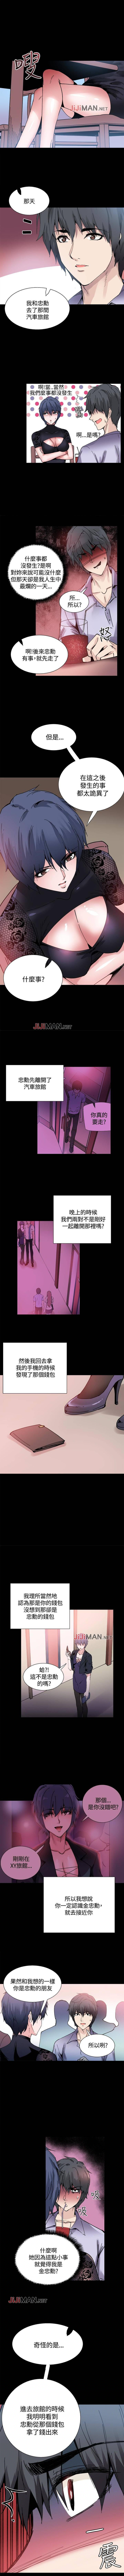 【已完结】Bodychange(作者:Seize & 死亡節奏) 第1~33话 58